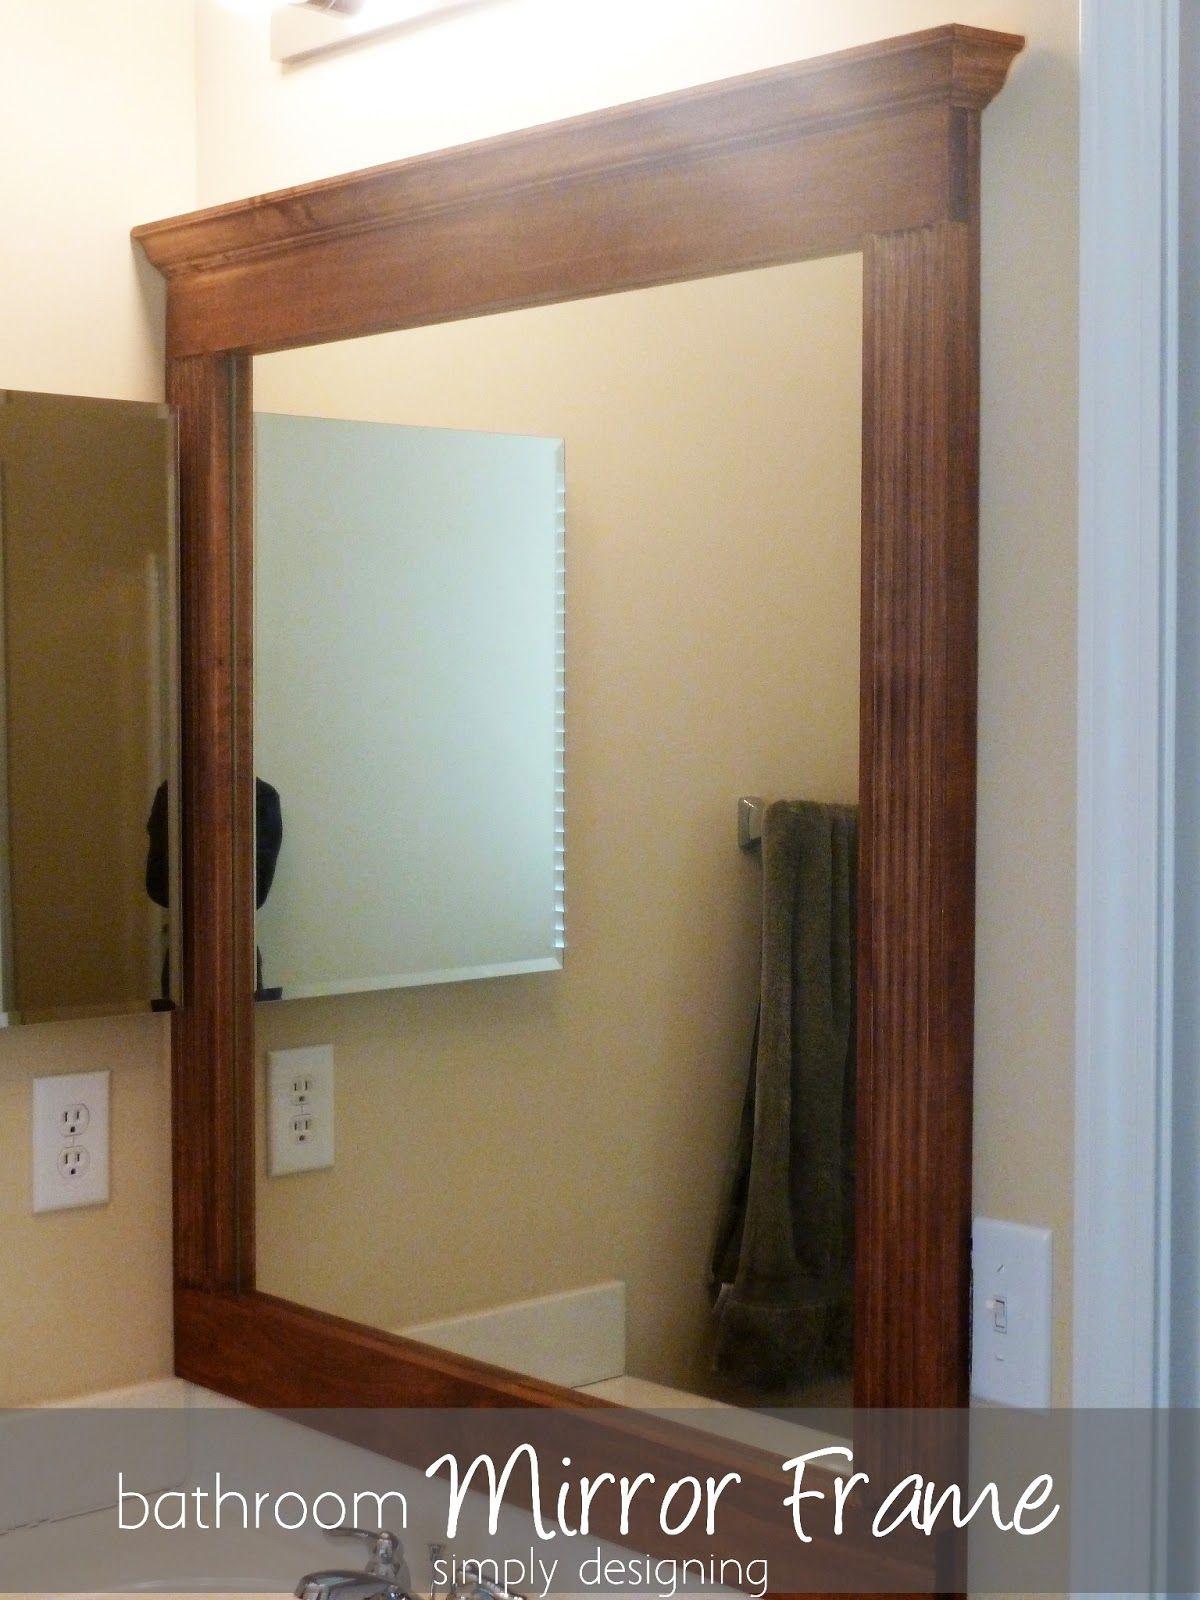 Designing Your Own Bathroom Amusing Bathroom Mirror Revamp Part 2  Bathroom Mirrors Bathroom Decorating Inspiration